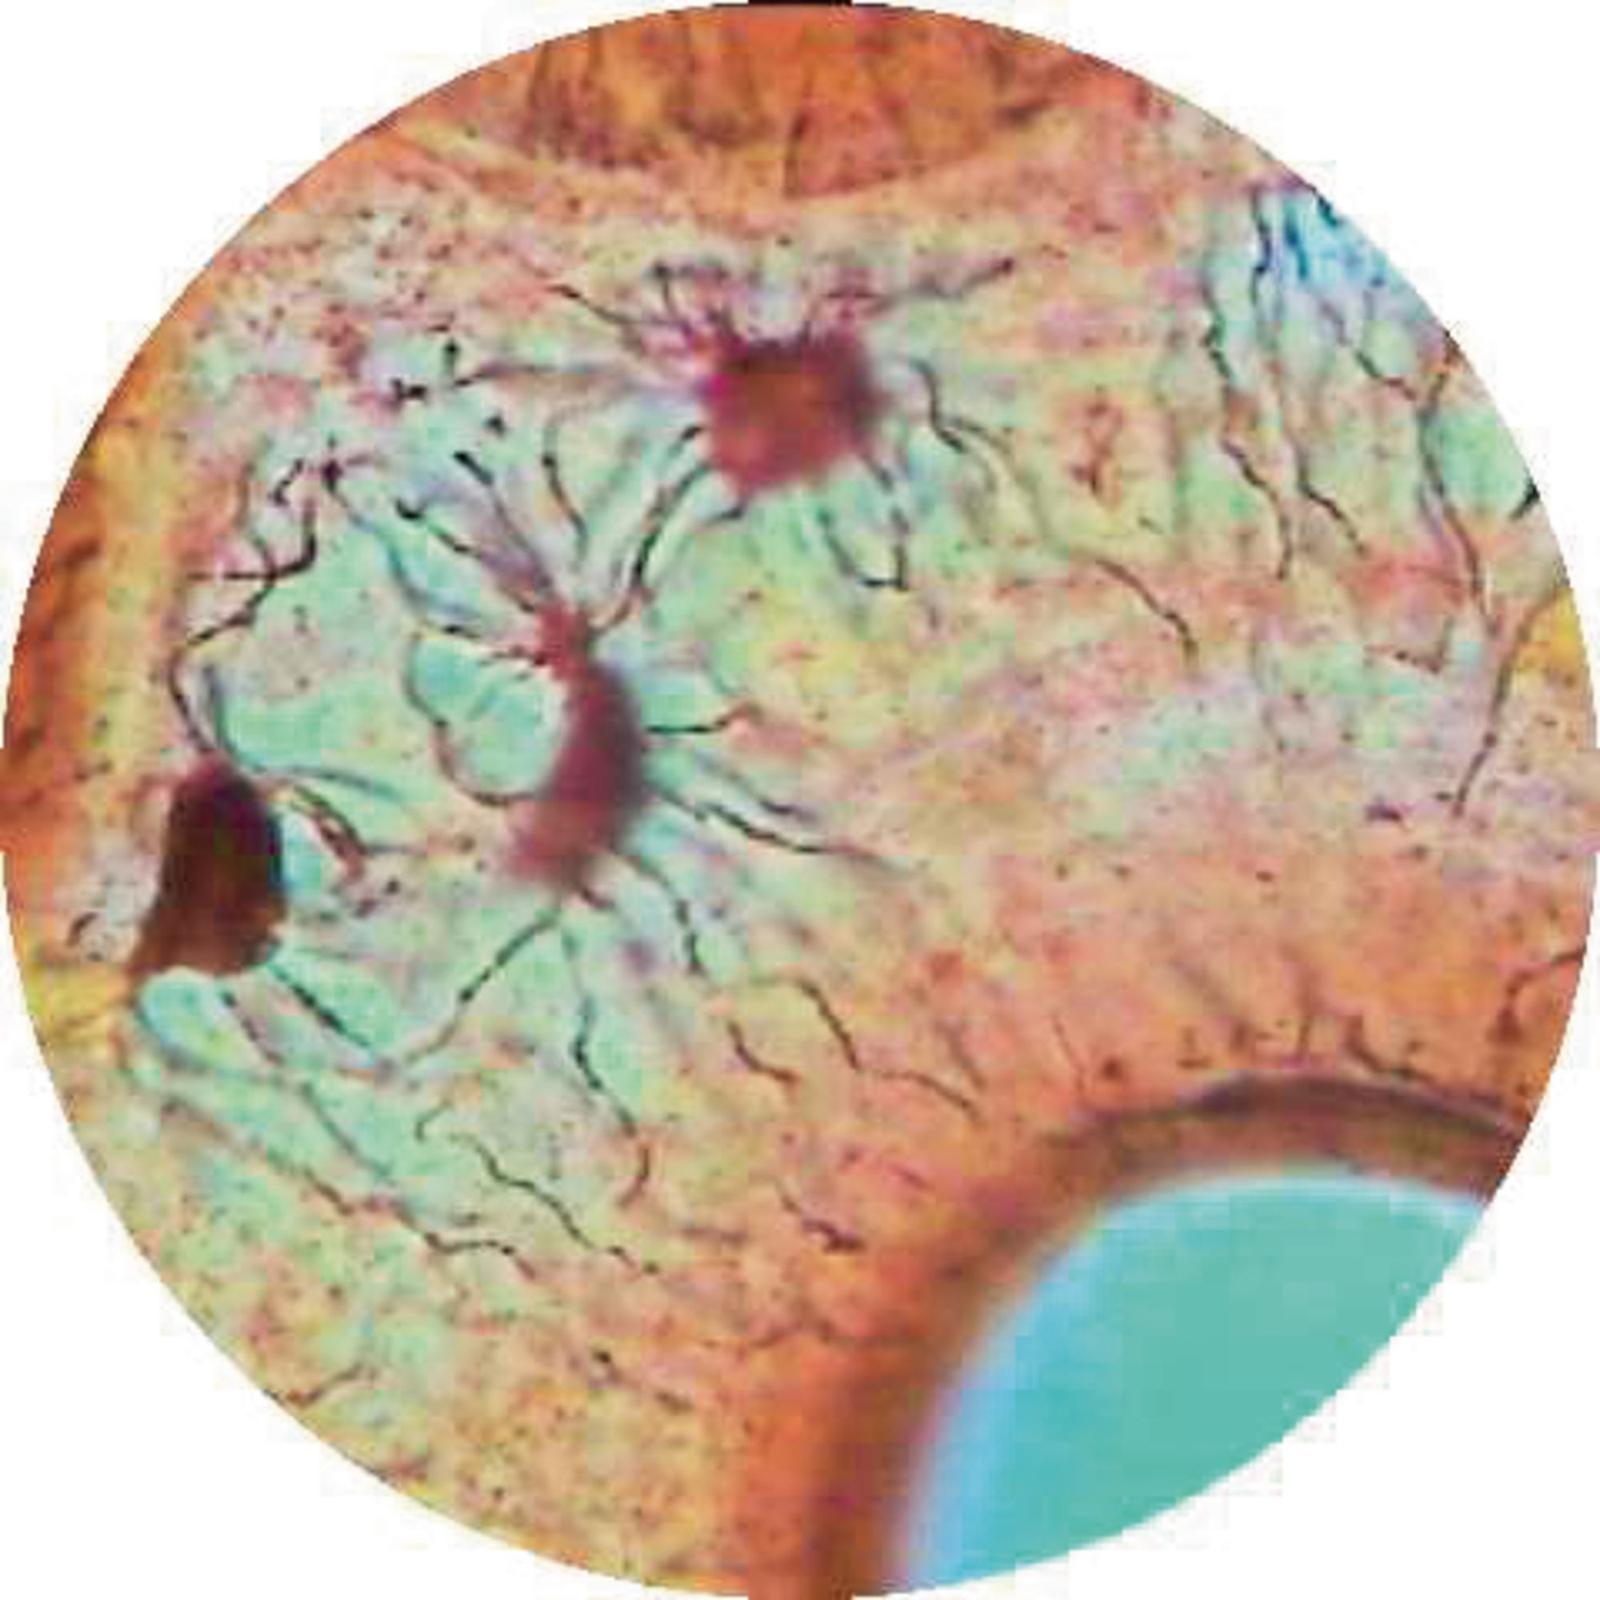 Tendon Ls White Fibrous Connective Tissue Gls Educational Supplies